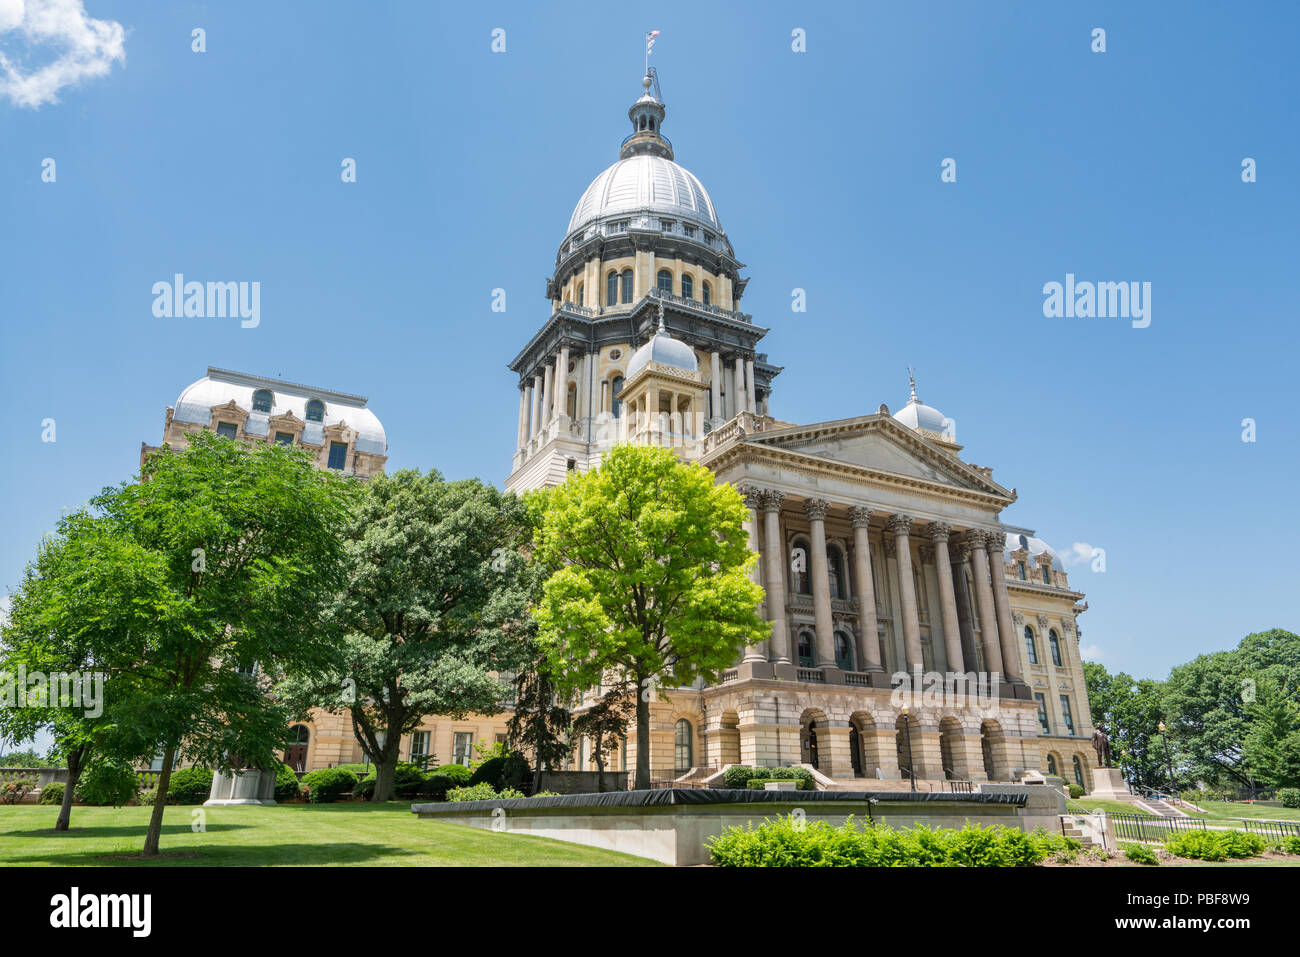 Illinois State Capital Building in Springfield, Illinois - Stock Image